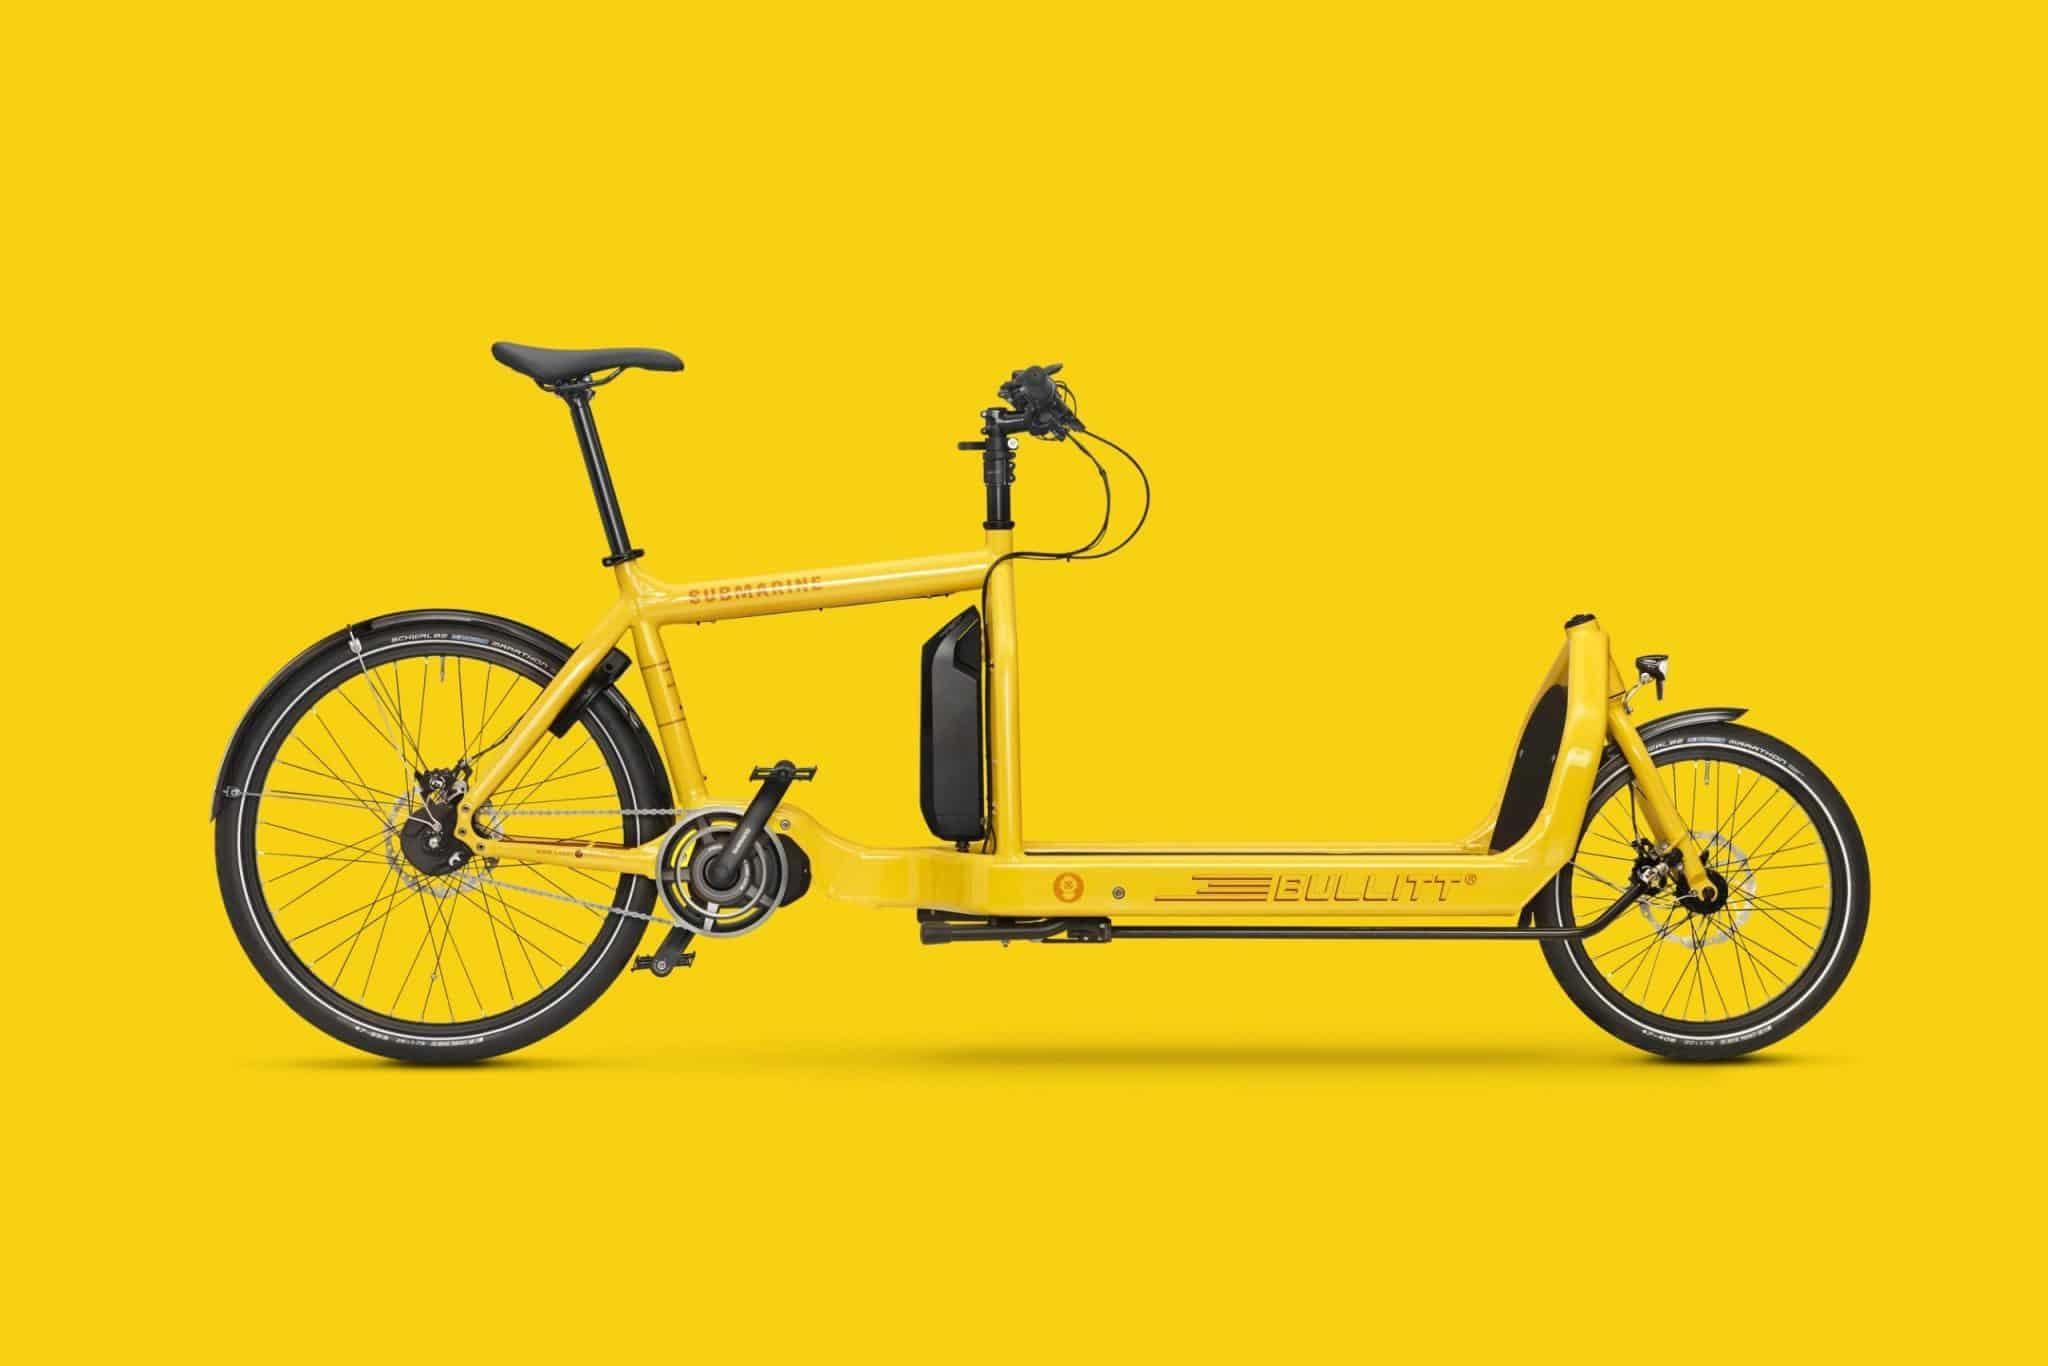 Bullitt electric cargo bike in yellow